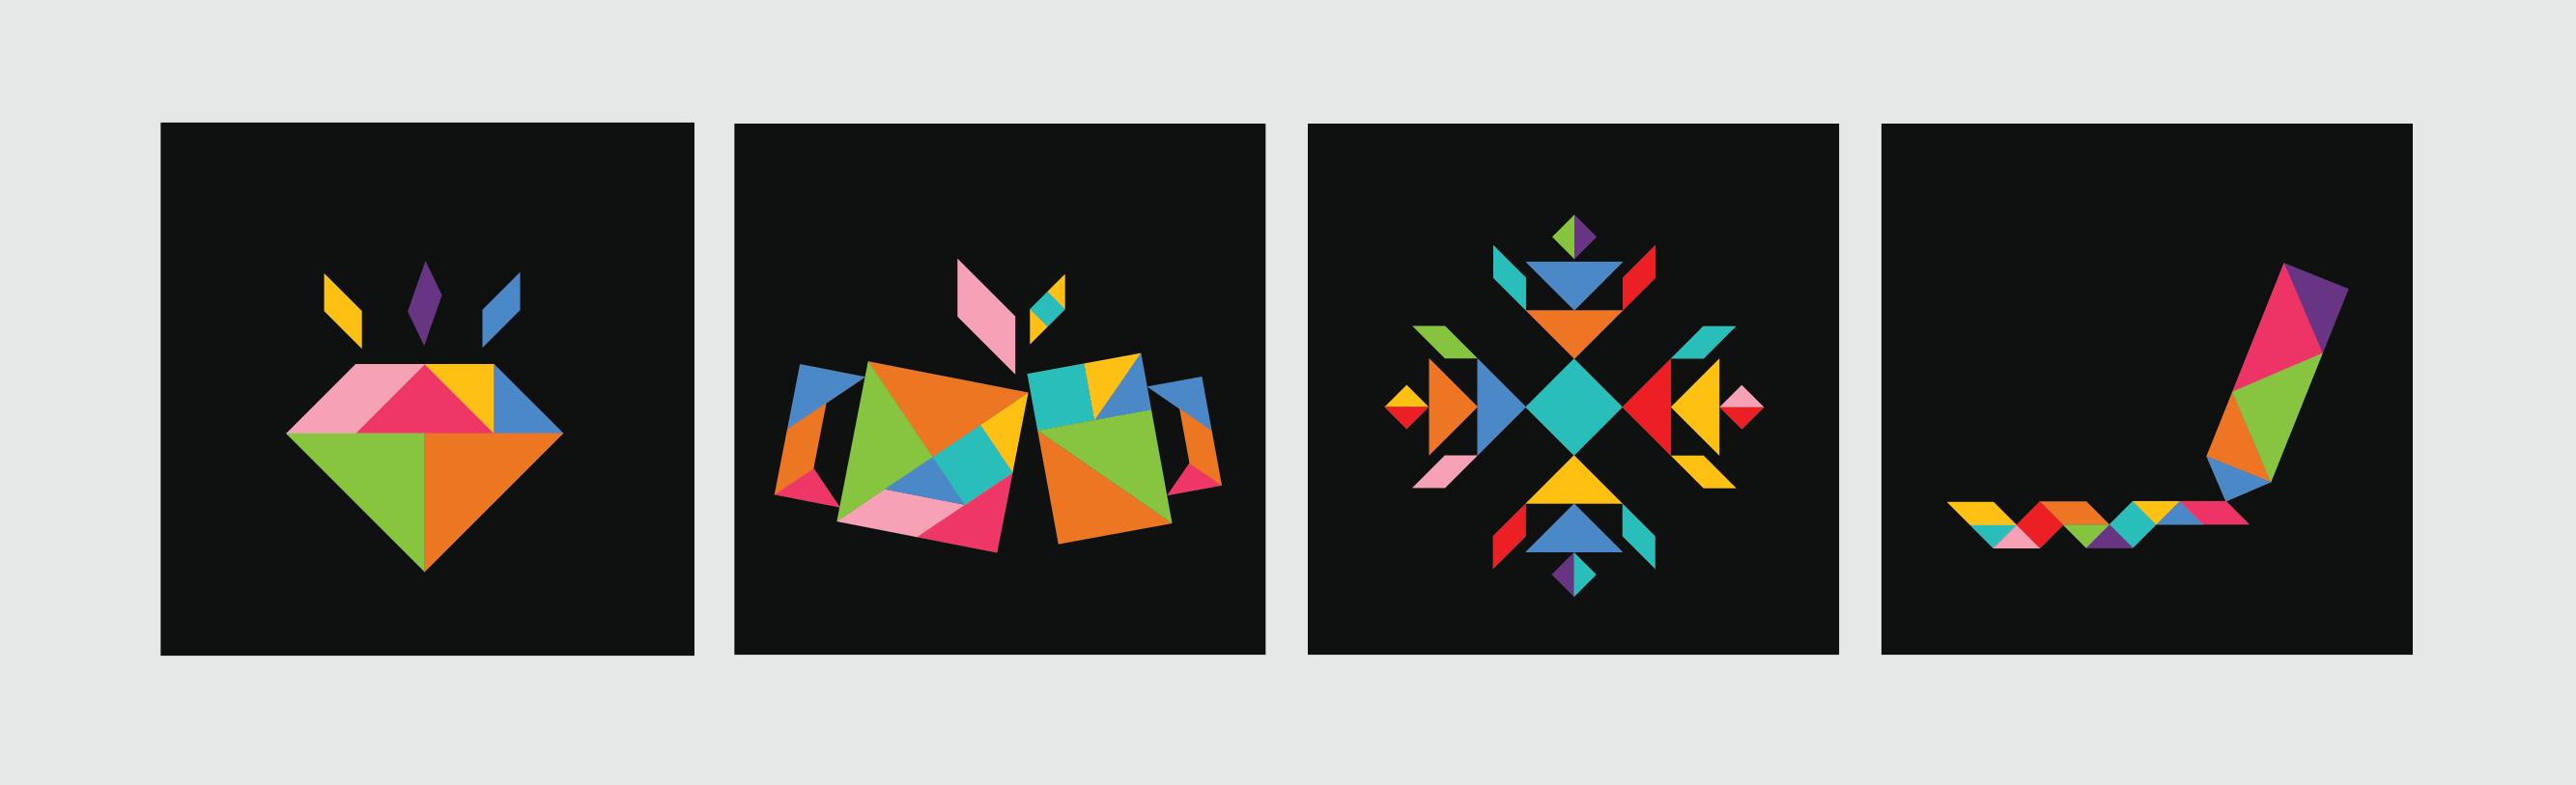 Illustrations-01